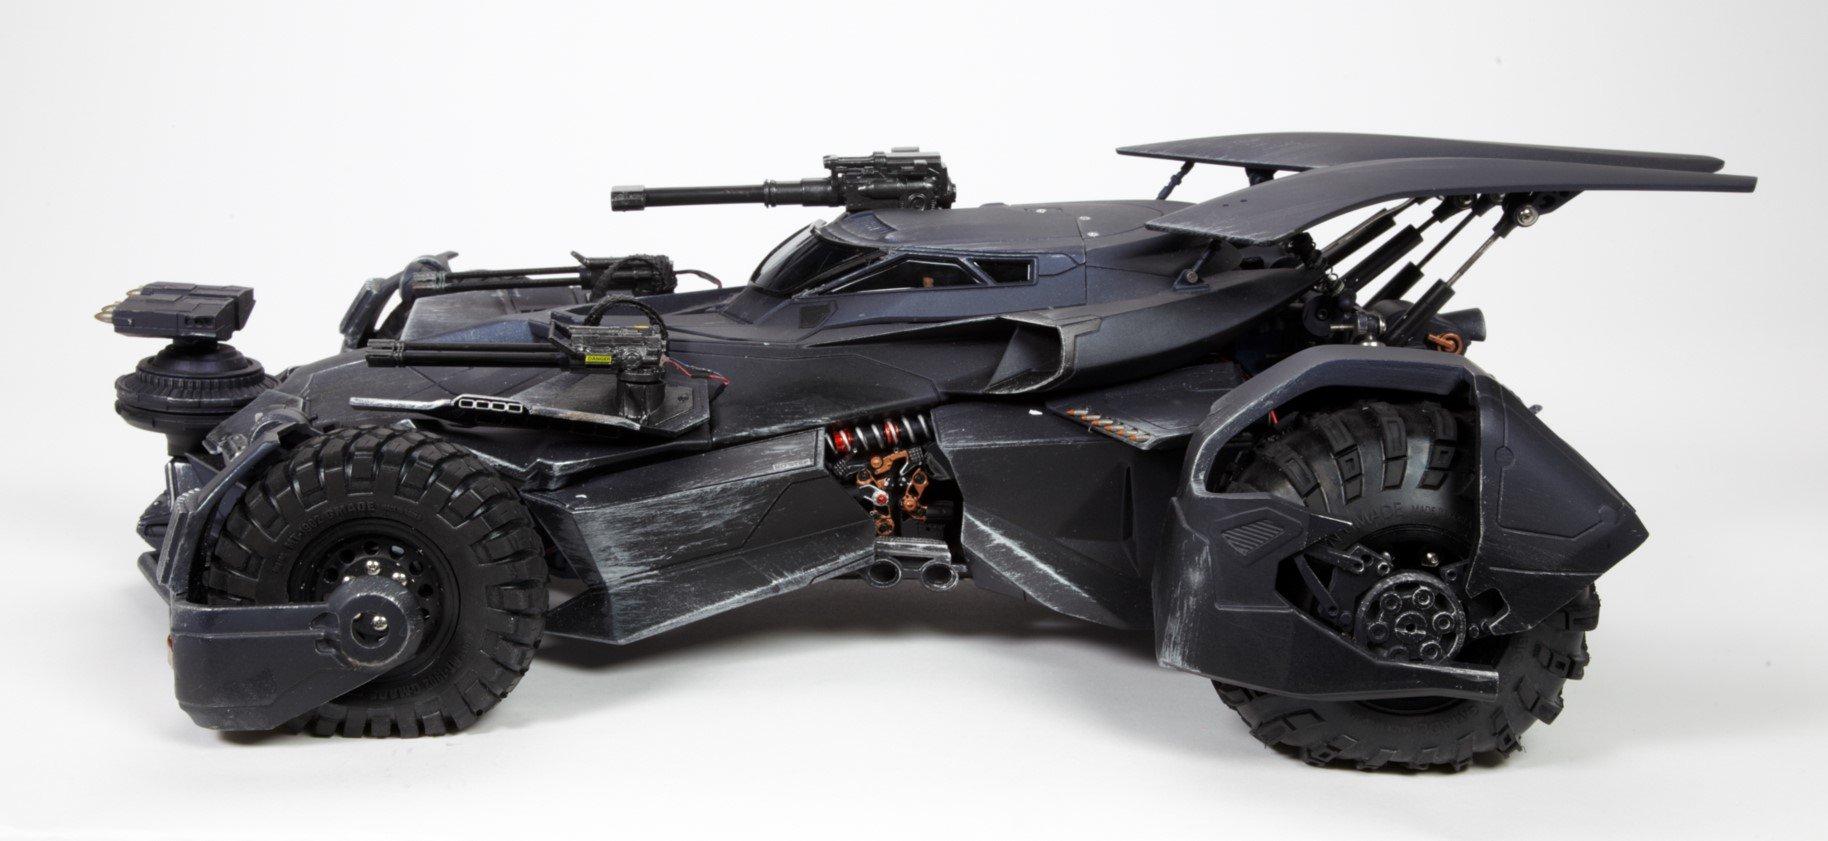 szmk_batmobile_justice_league_igazsag_ligaja_6.jpg